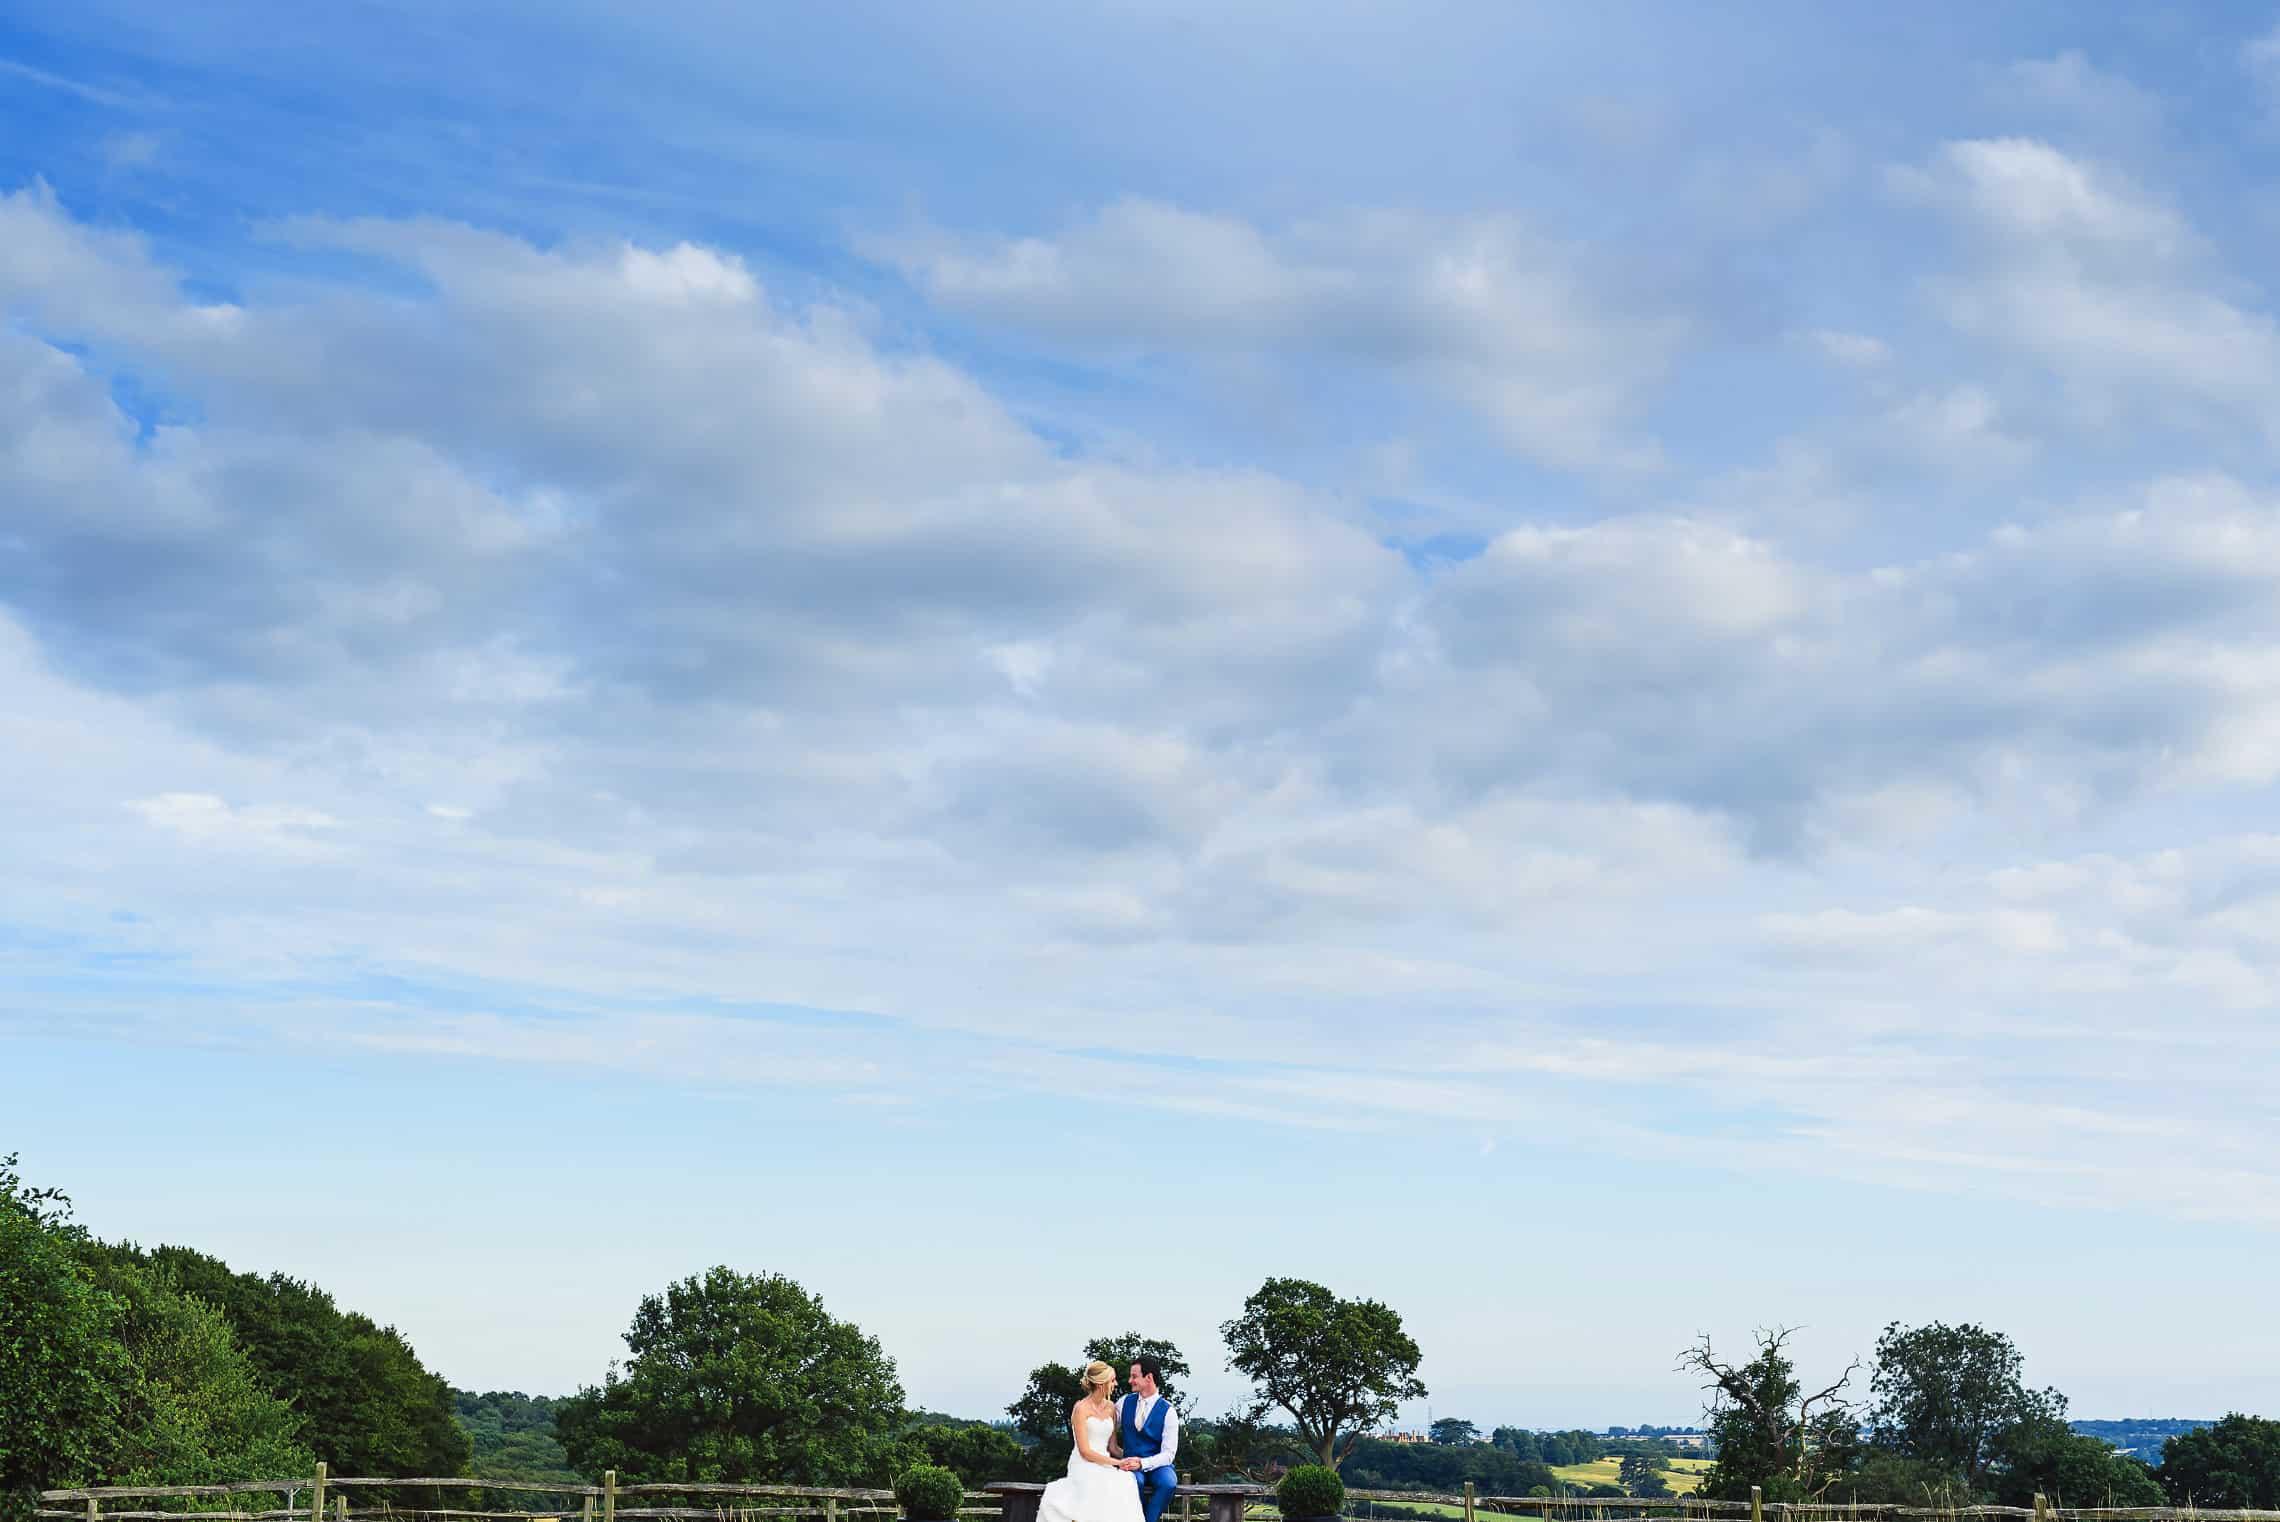 gaynes_park_wedding_lm_justin_bailey_photography_014